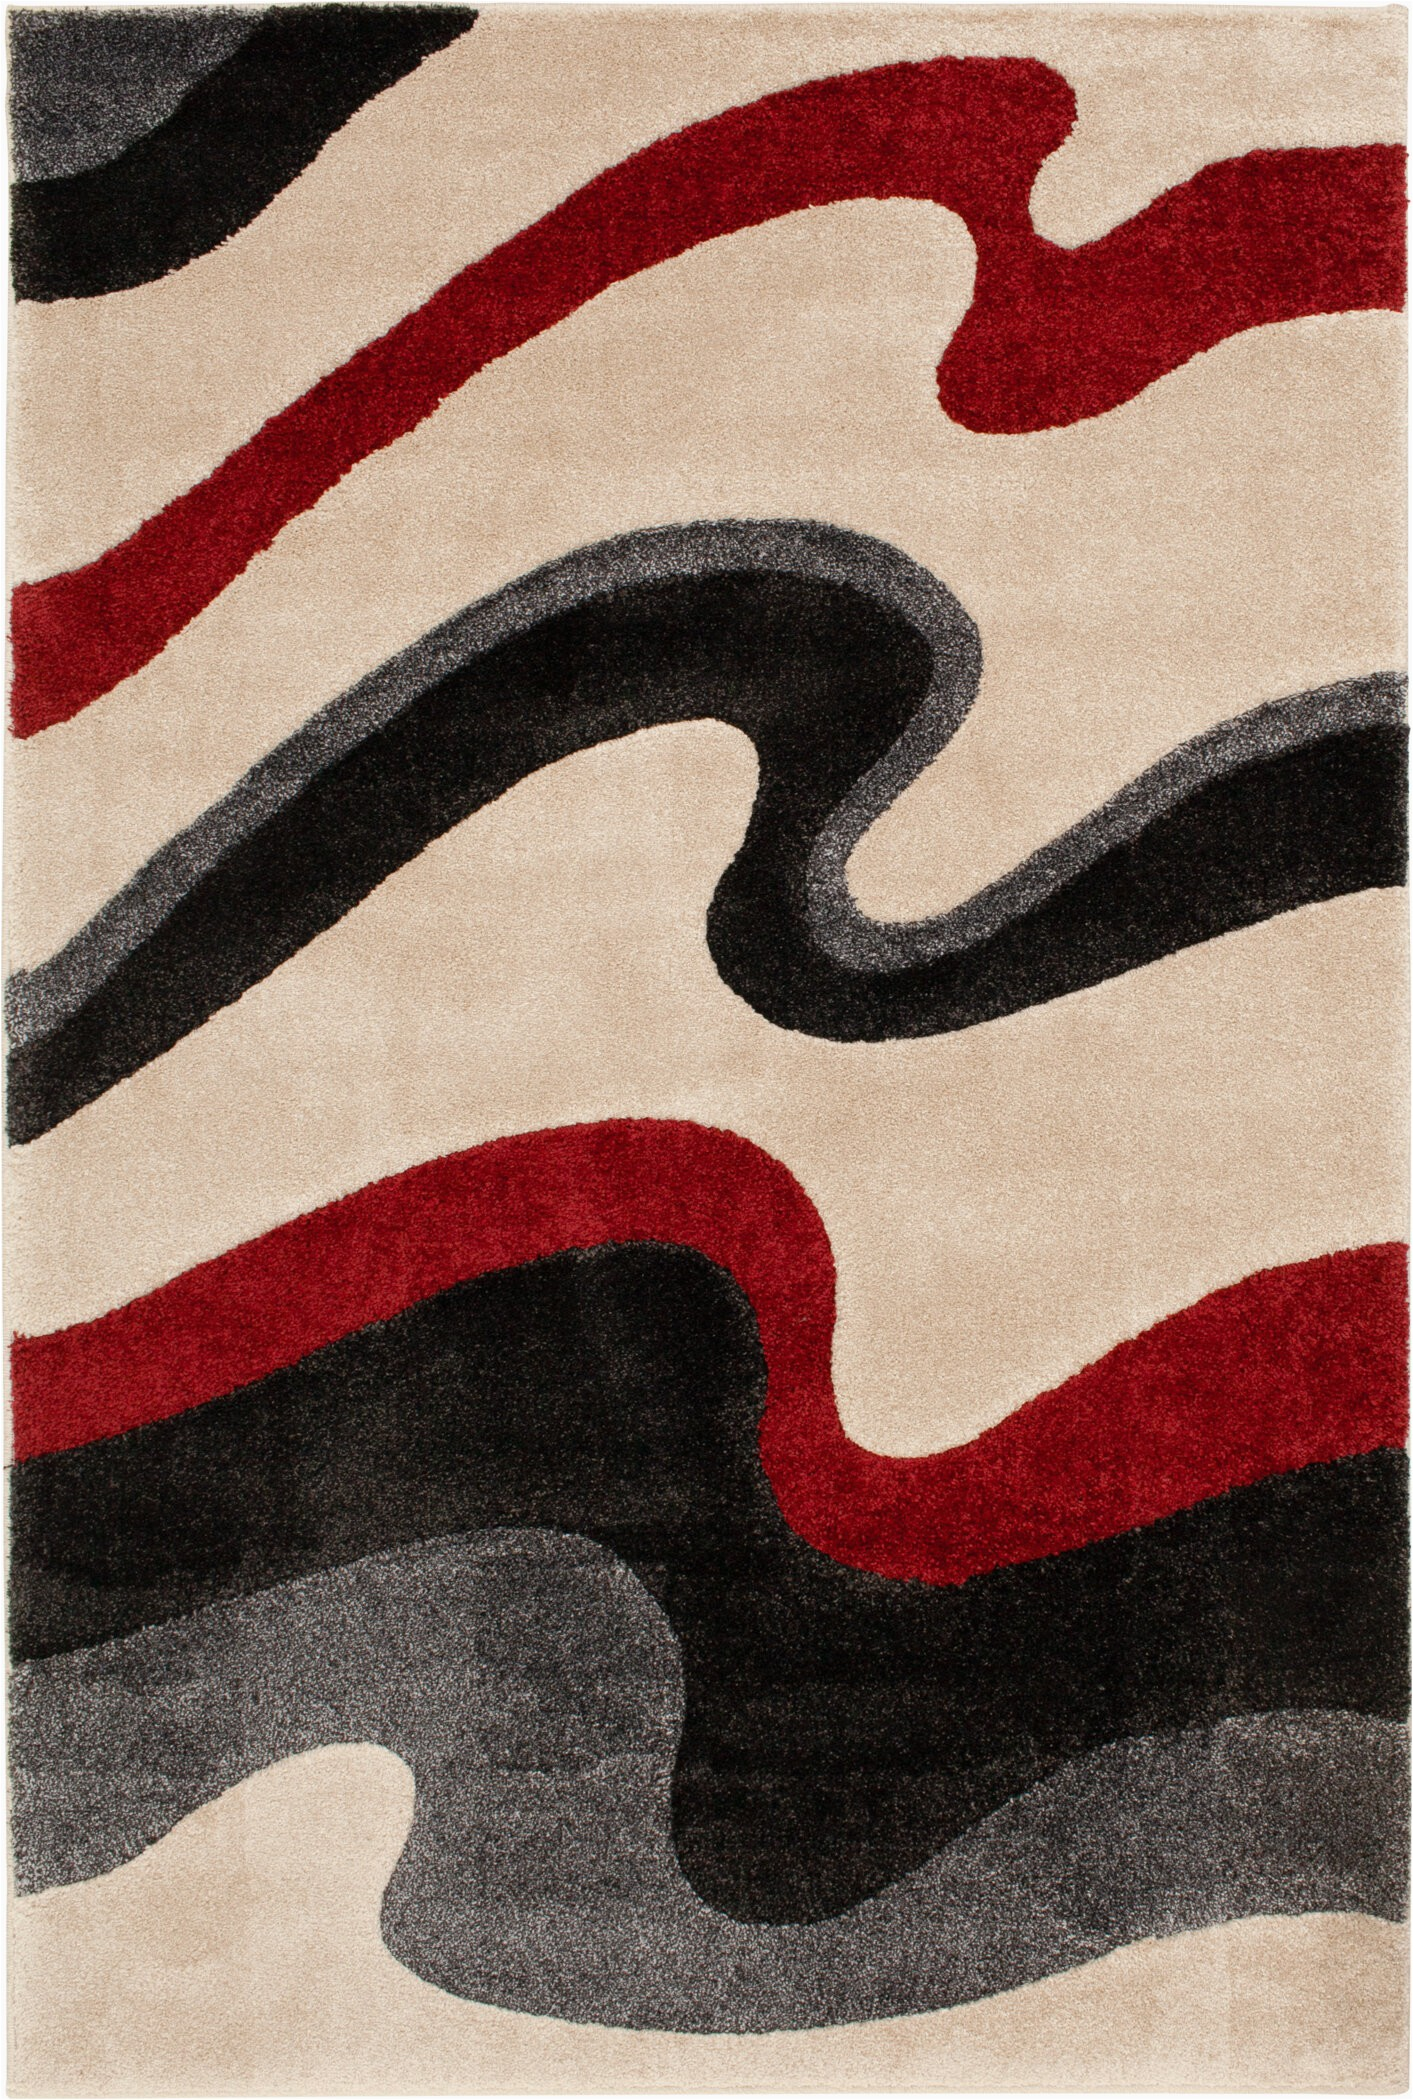 stian creamredblack area rug